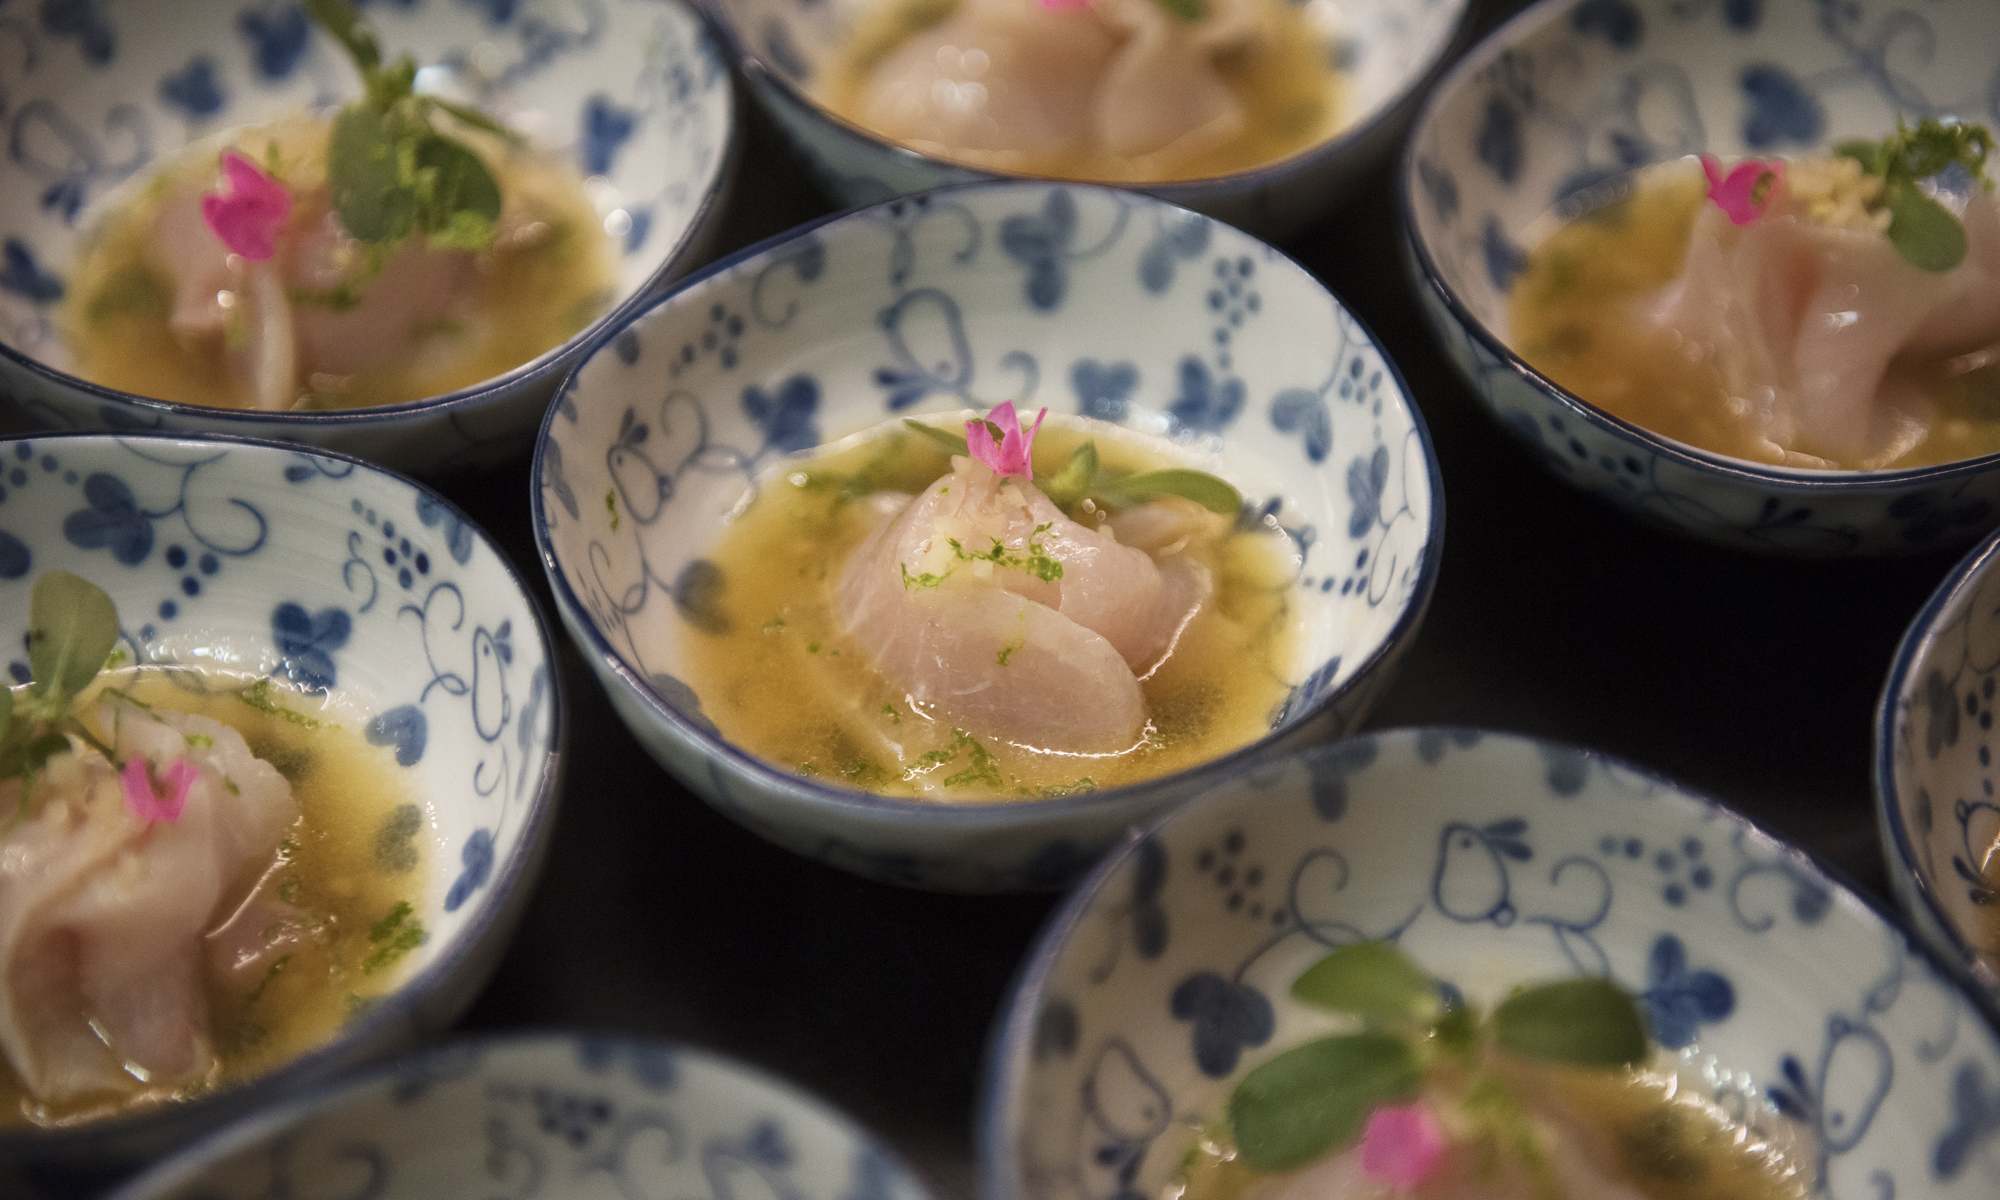 Toyo Eatery - kinilaw.jpg (original size)